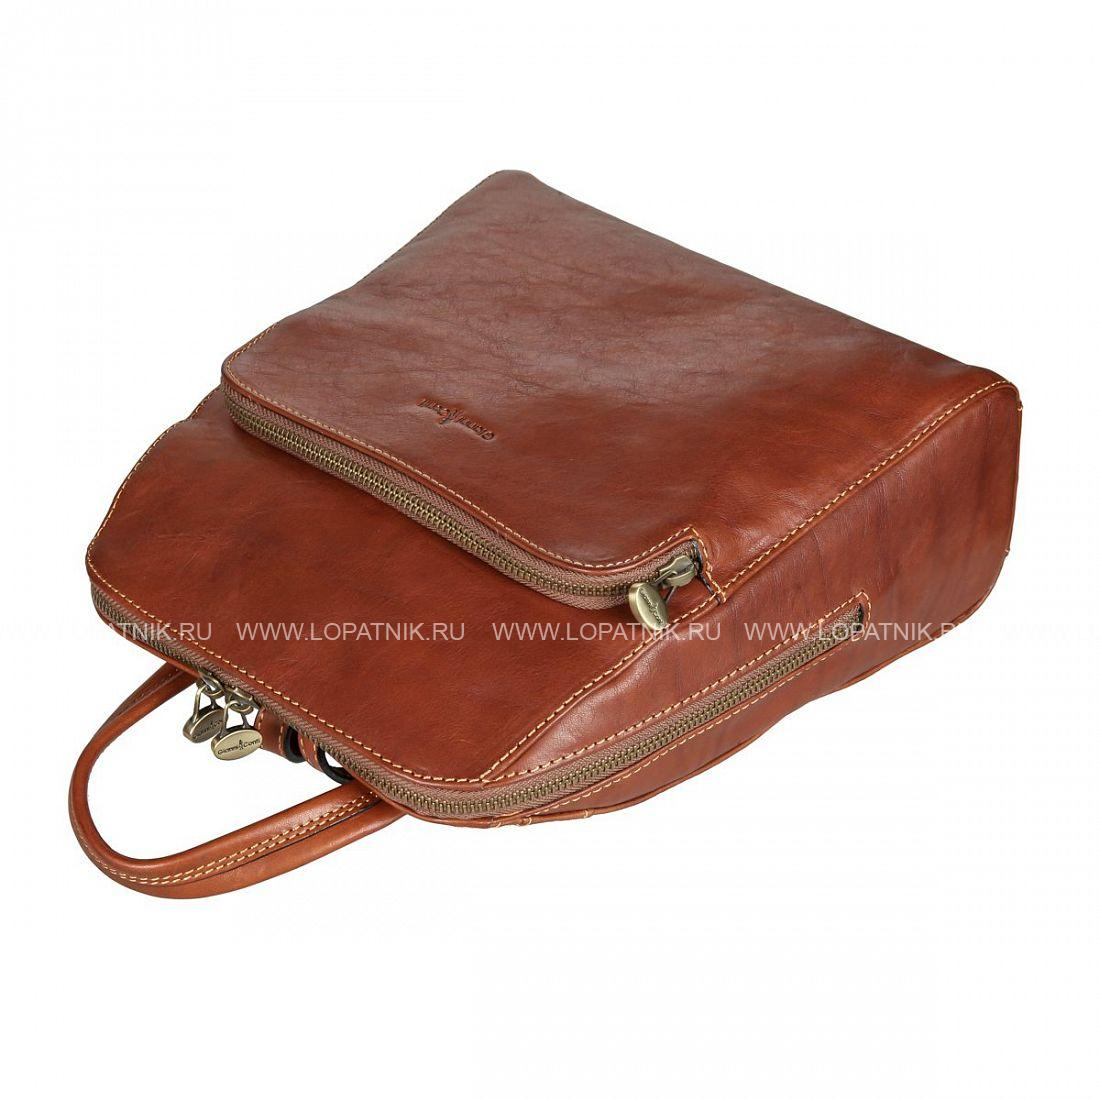 33b5f155e5da Рюкзак кожаный женский. Артикул:913125 tan. ID:104566. Производитель:Gianni  Conti